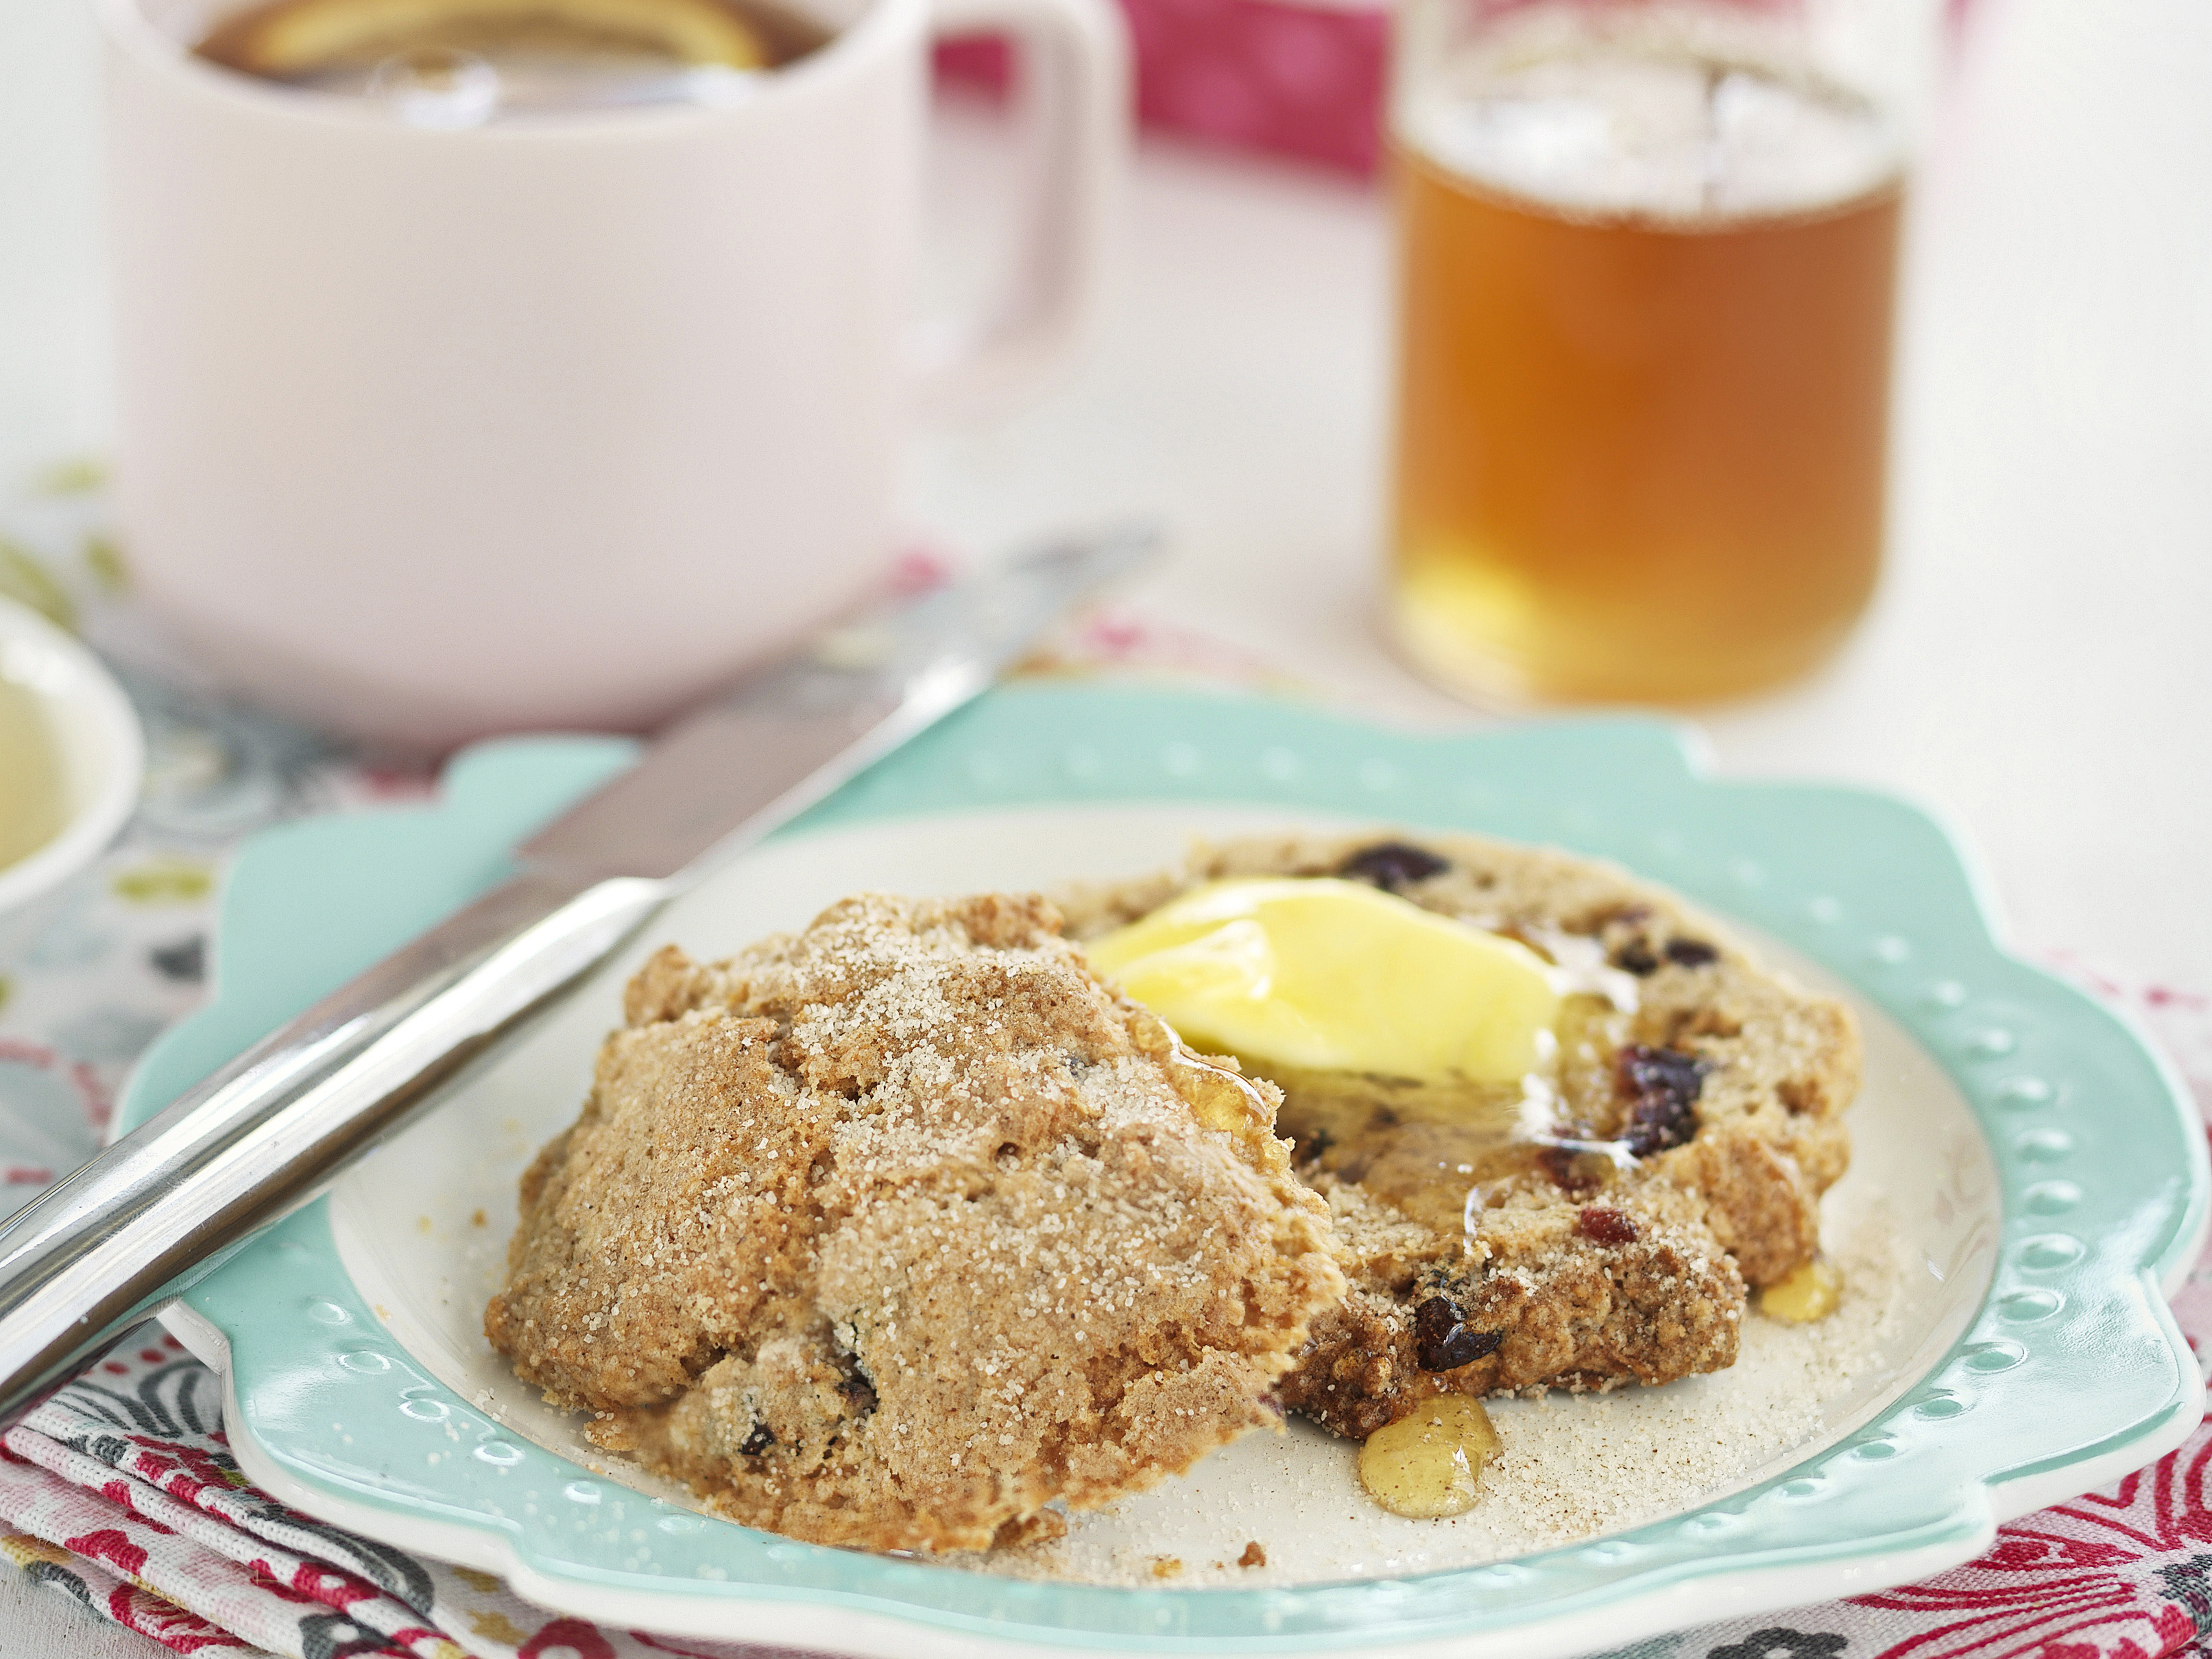 Rock cake recipe gluten free